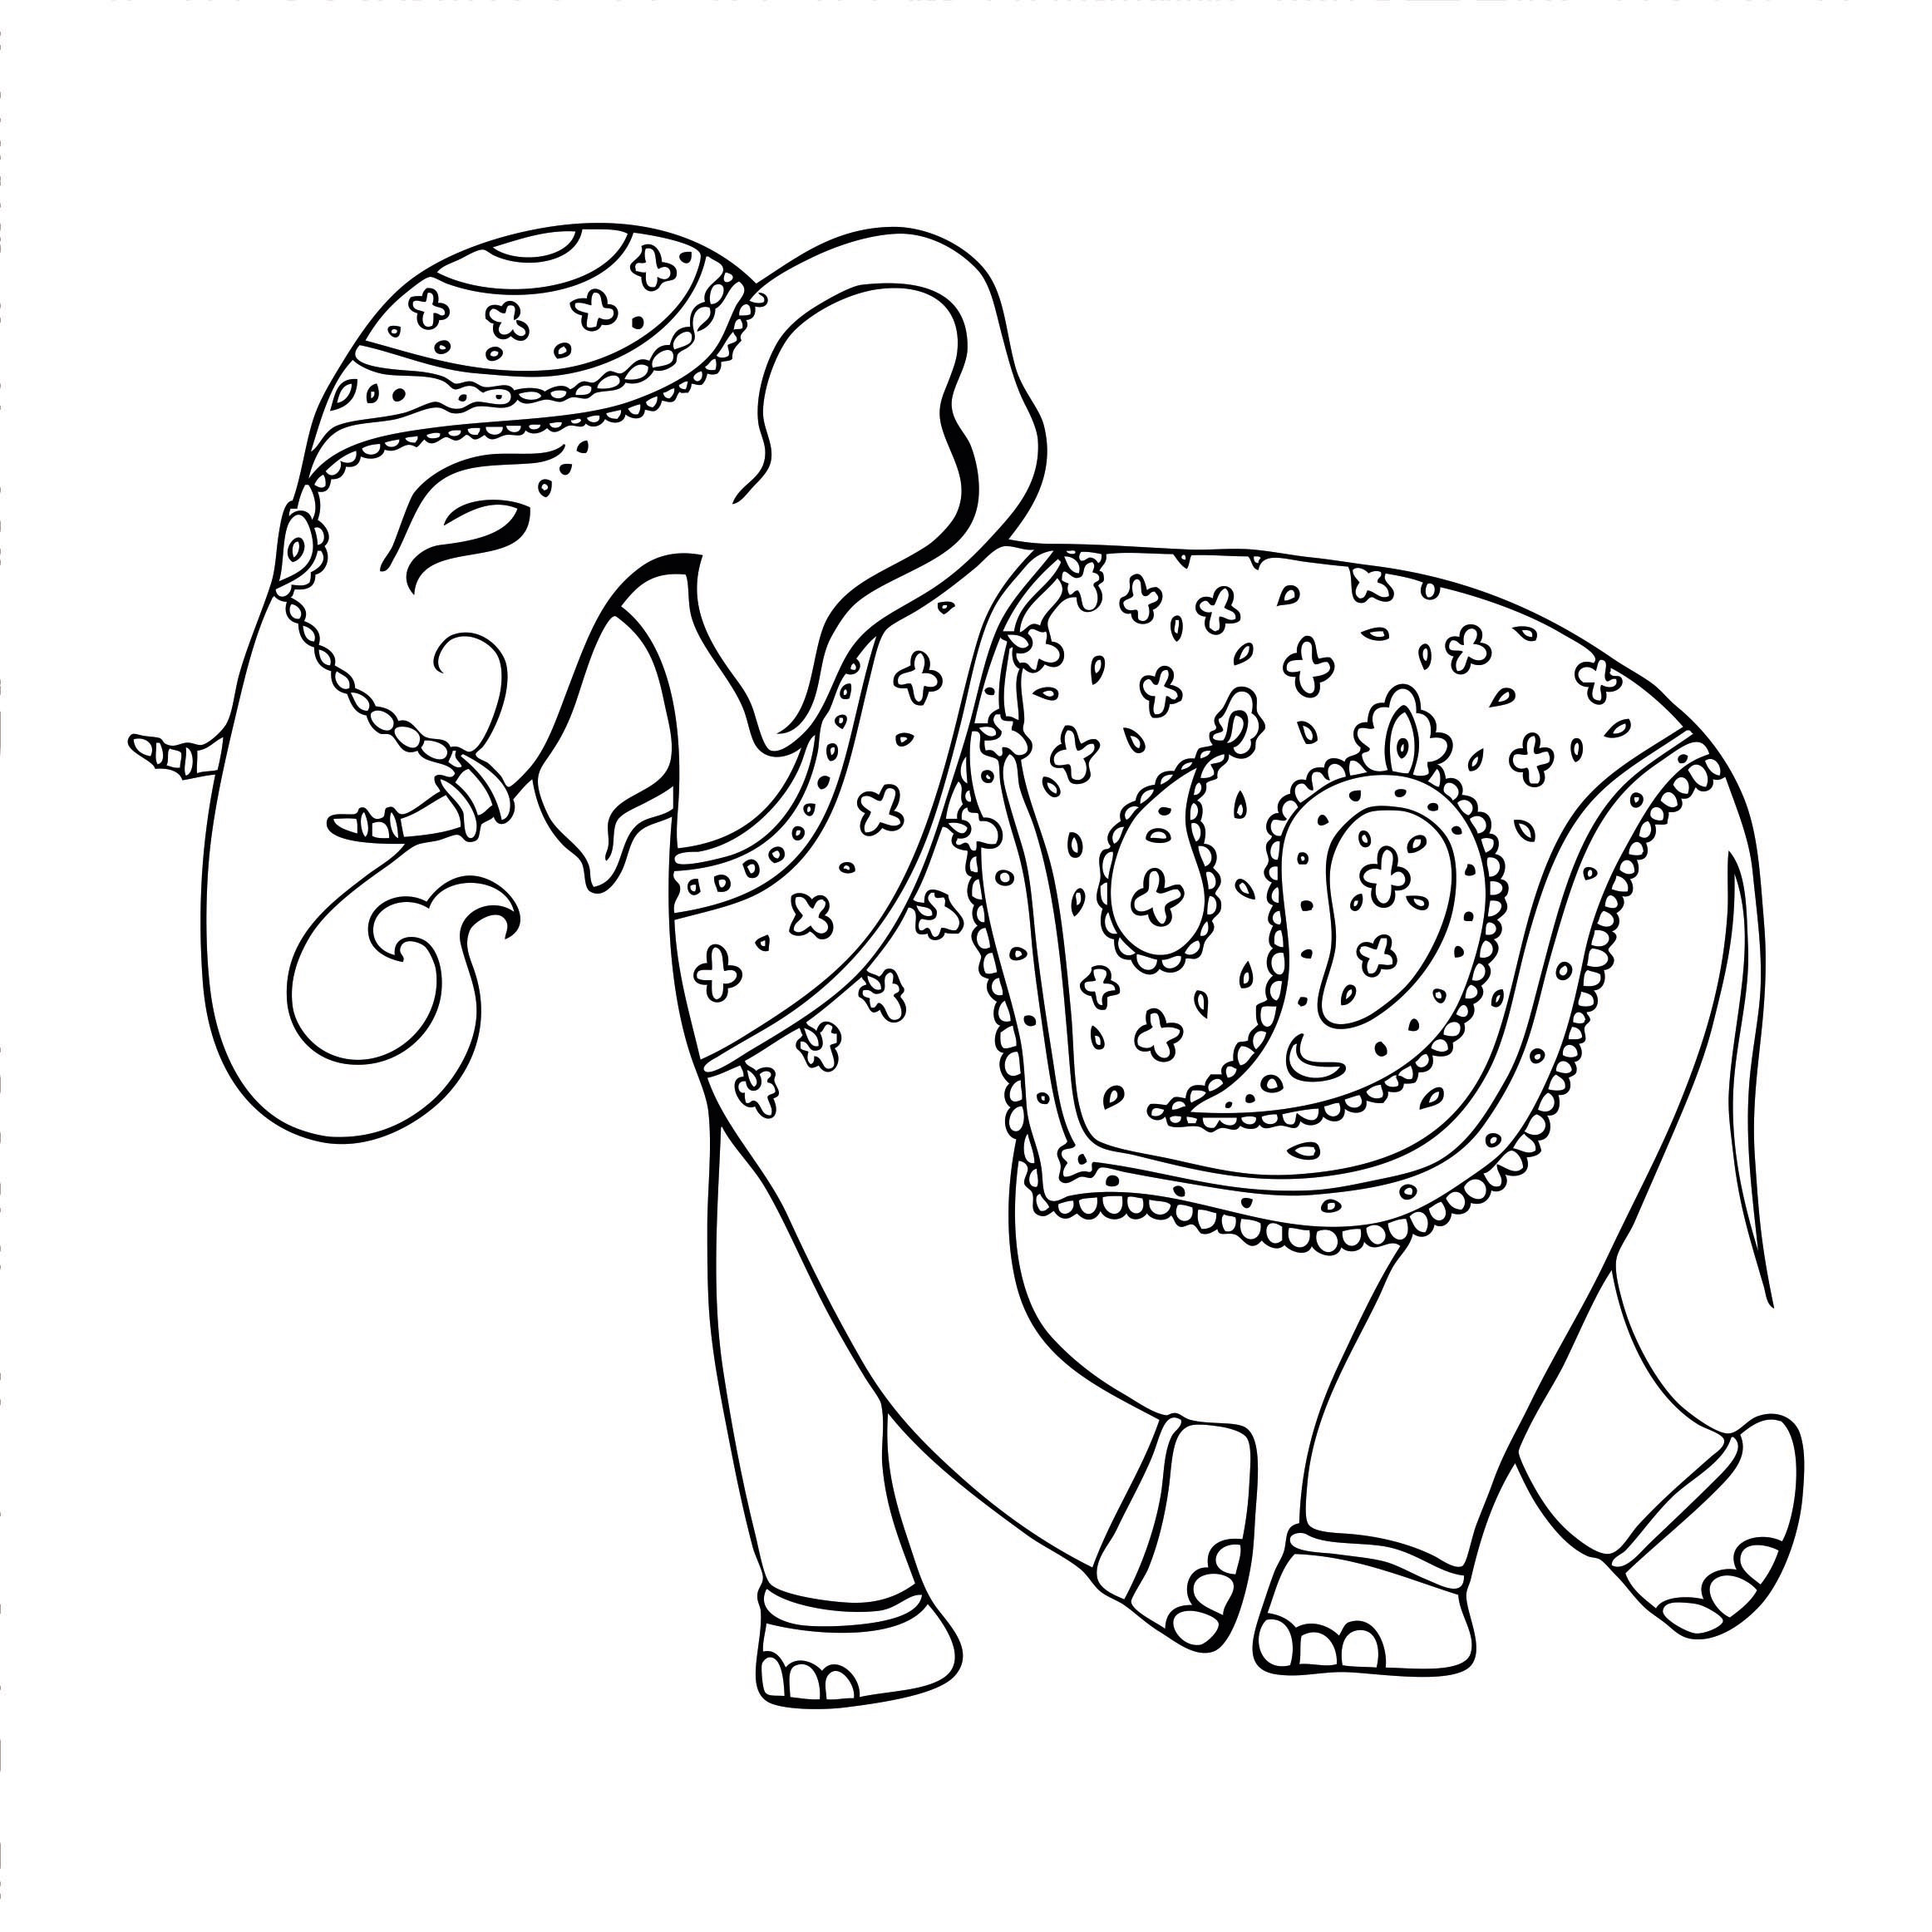 malvorlagen elefanten mandala | coloring and malvorlagan